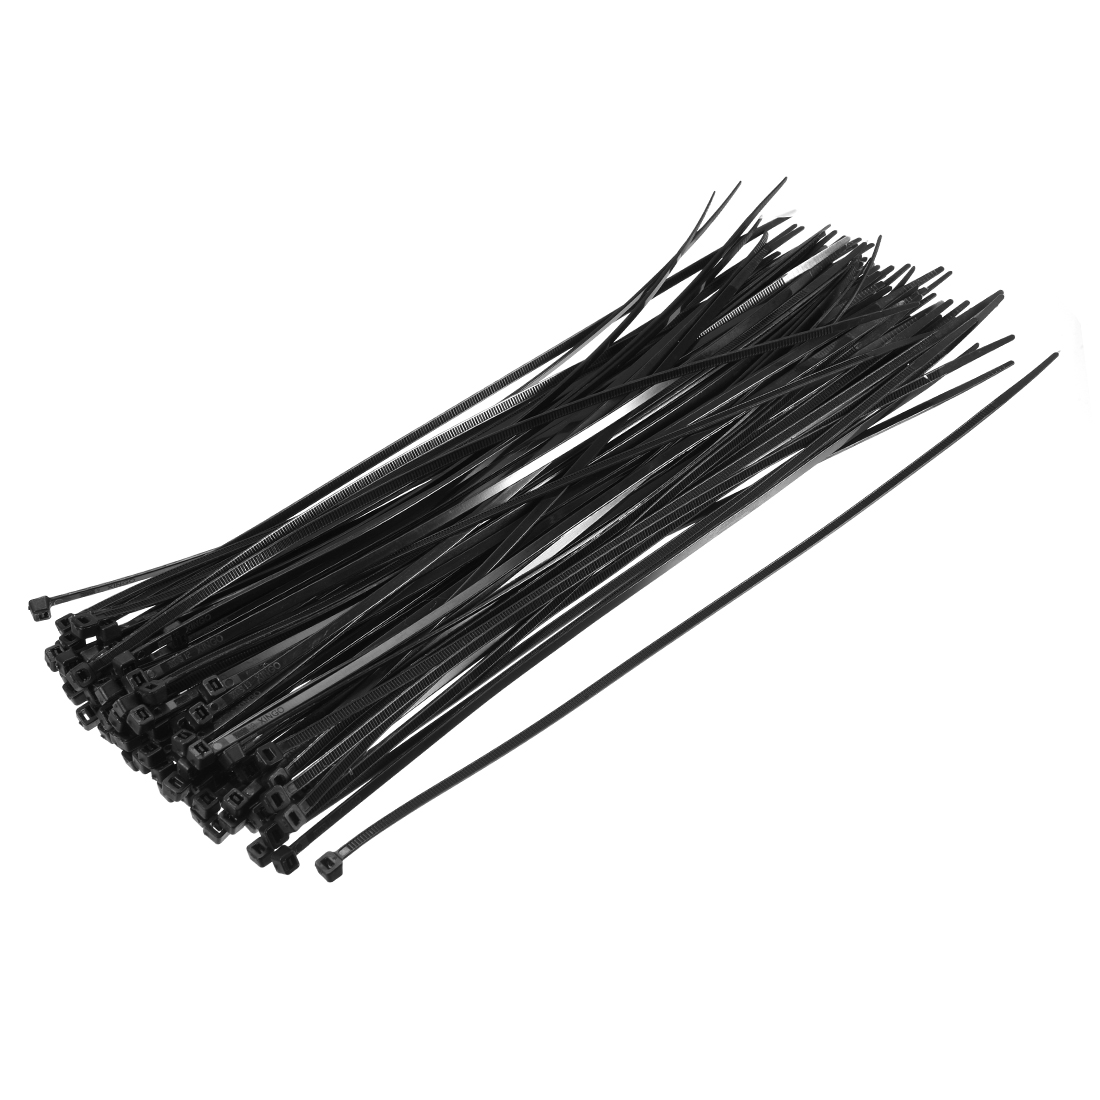 Cable Zip Ties 200mmx2.8mm Self-Locking Nylon Tie Wraps Black 150pcs